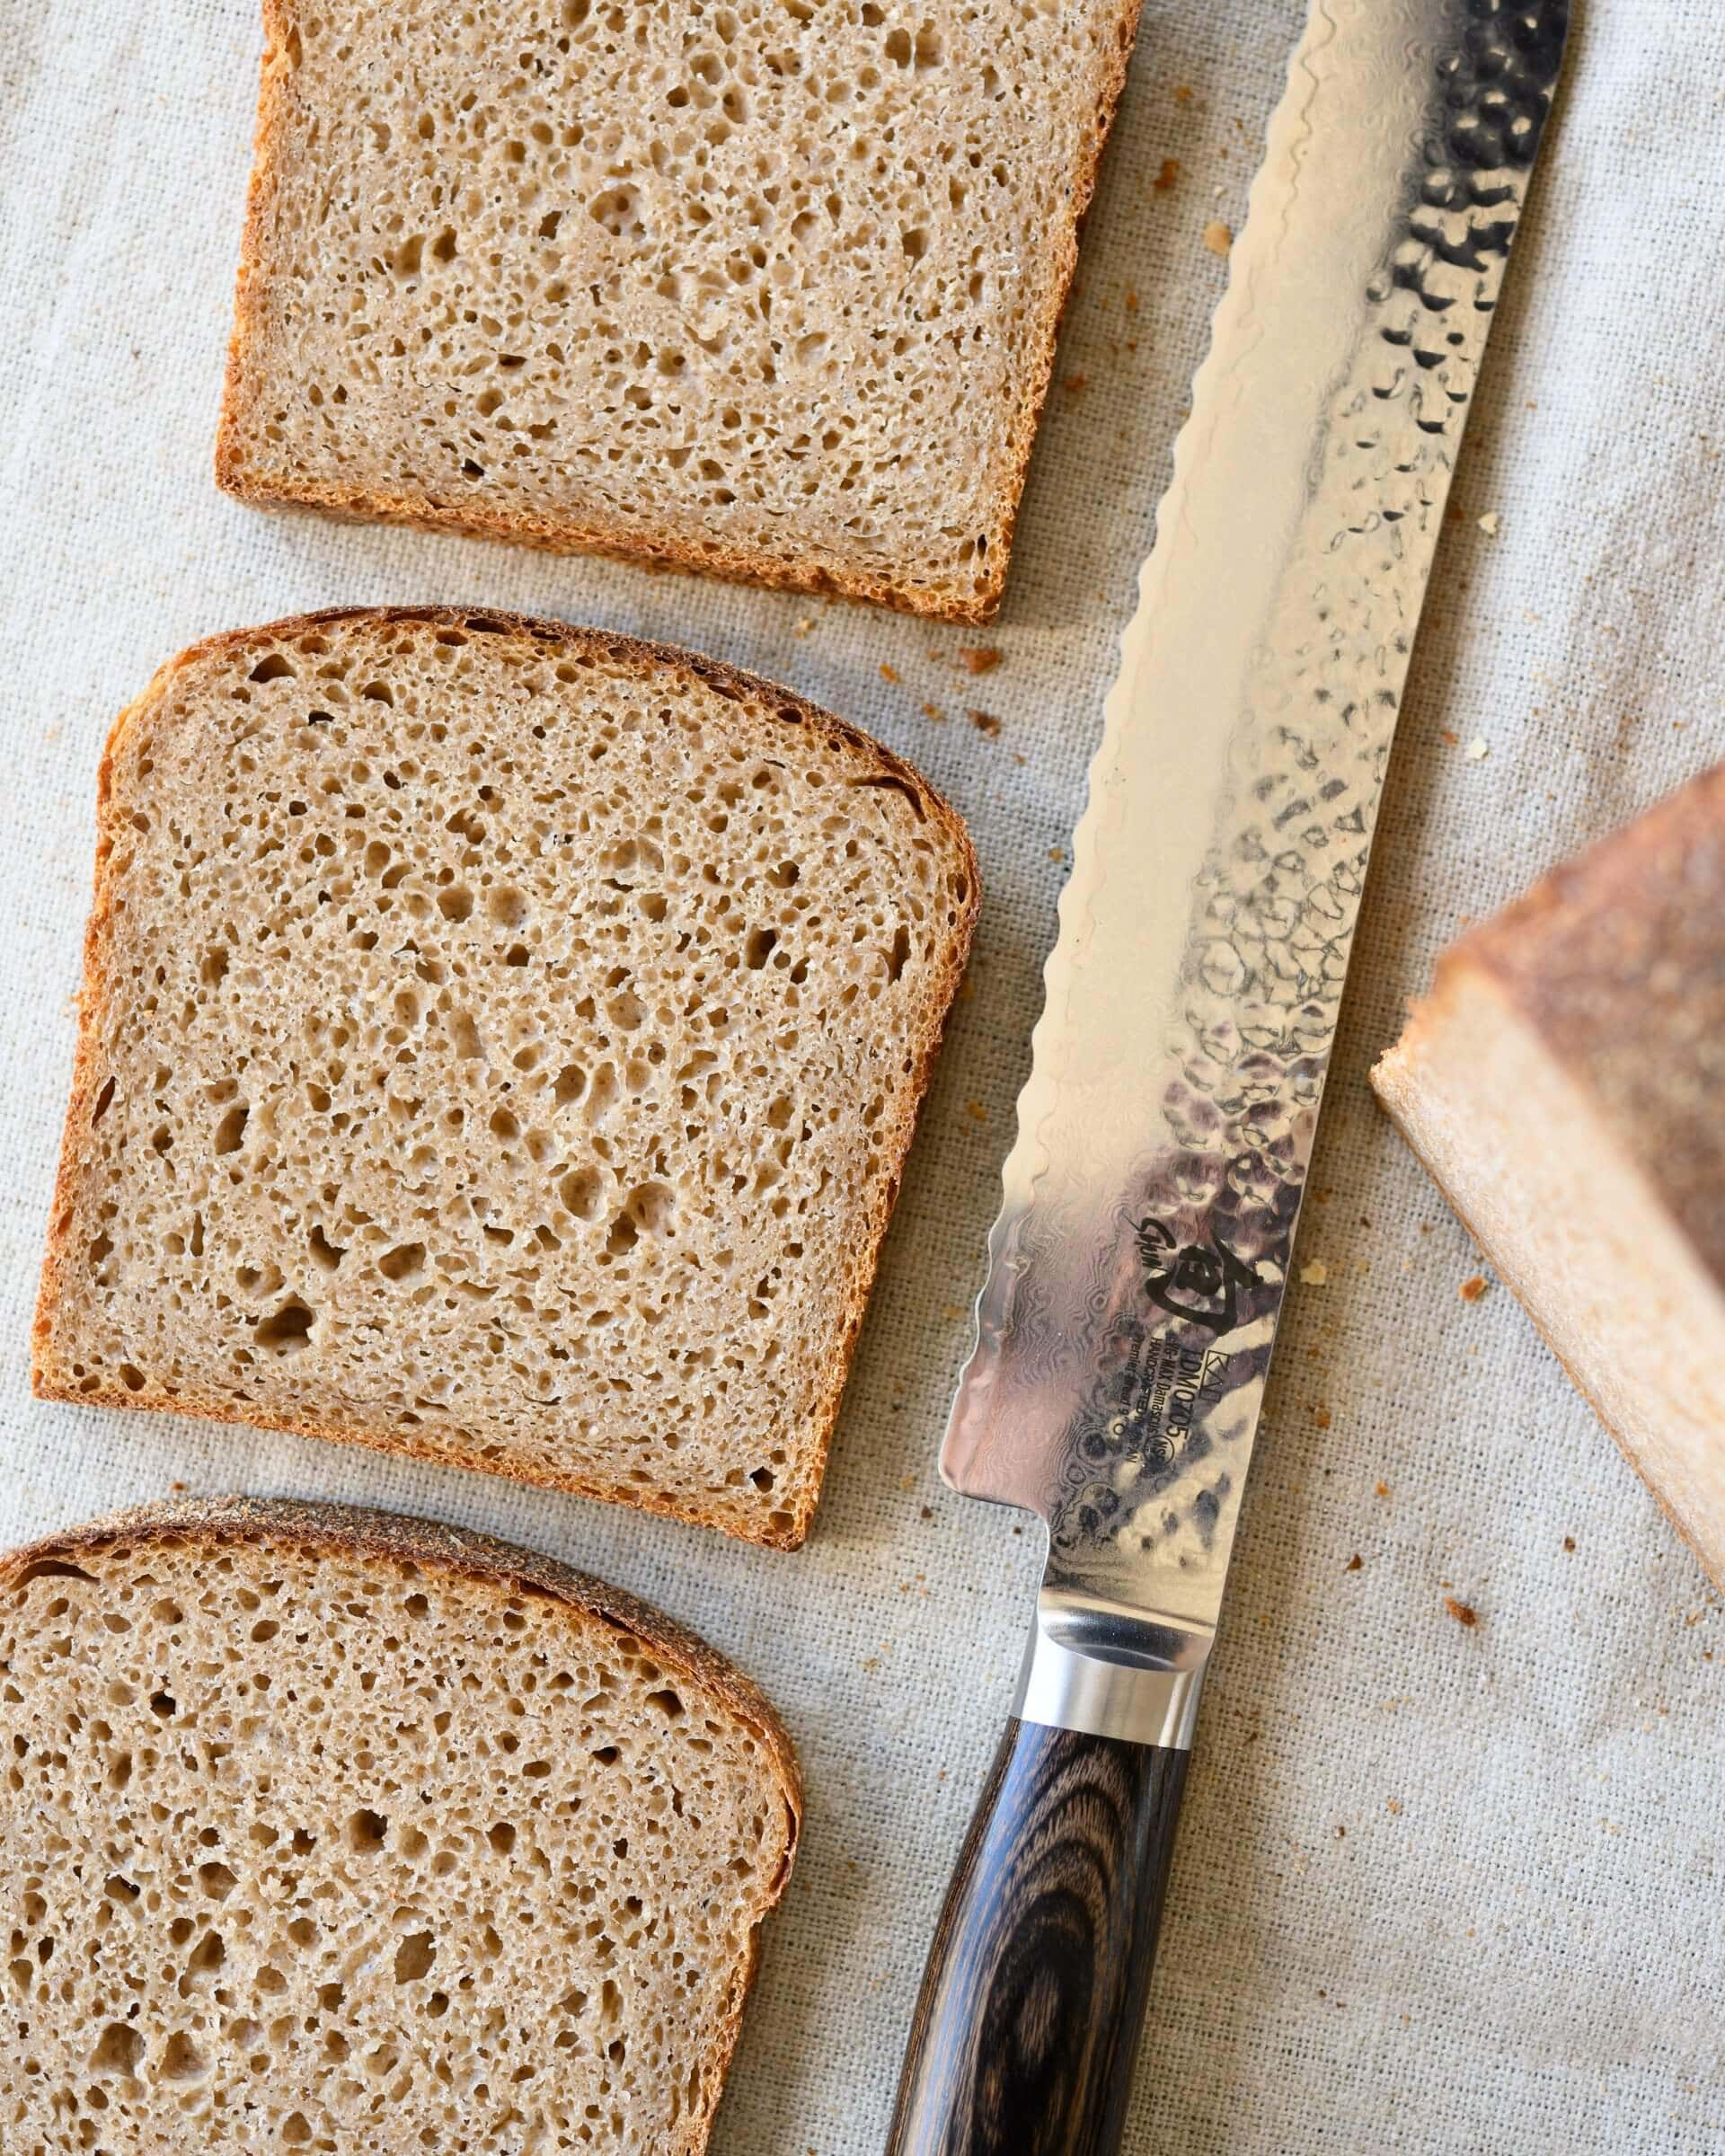 Crumb of the whole grain sourdough spelt pan loaf